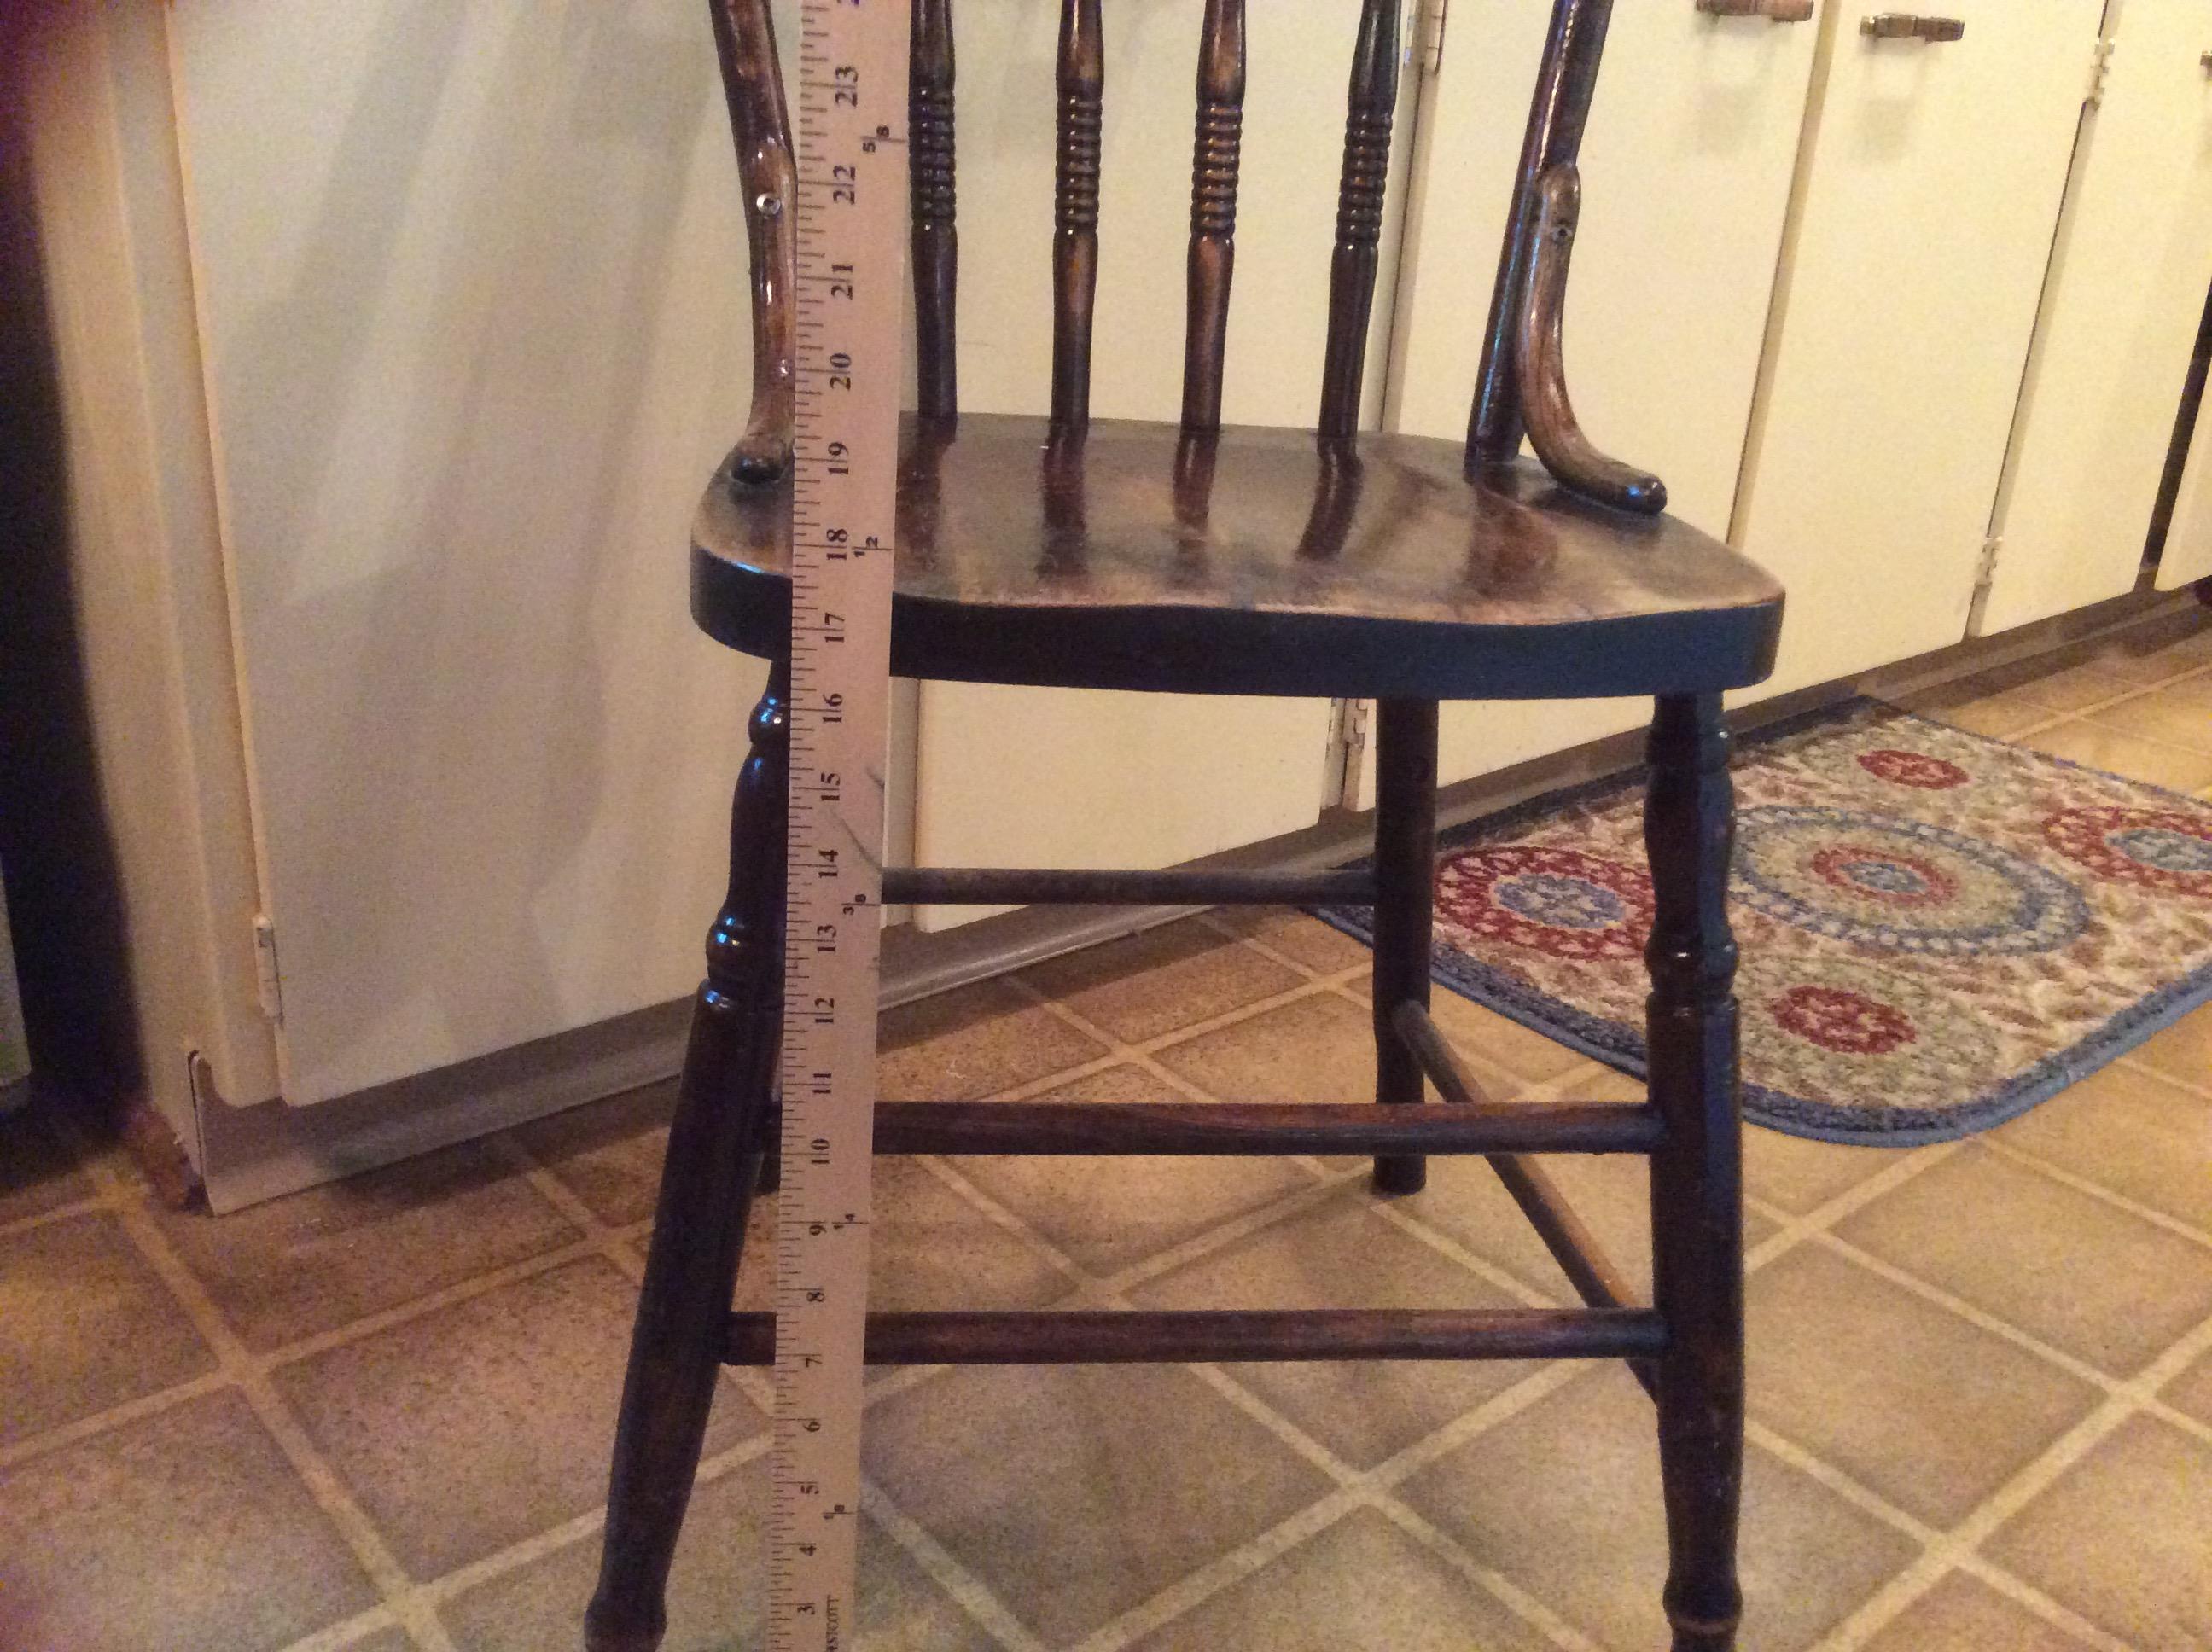 Home piano chair 2.JPG